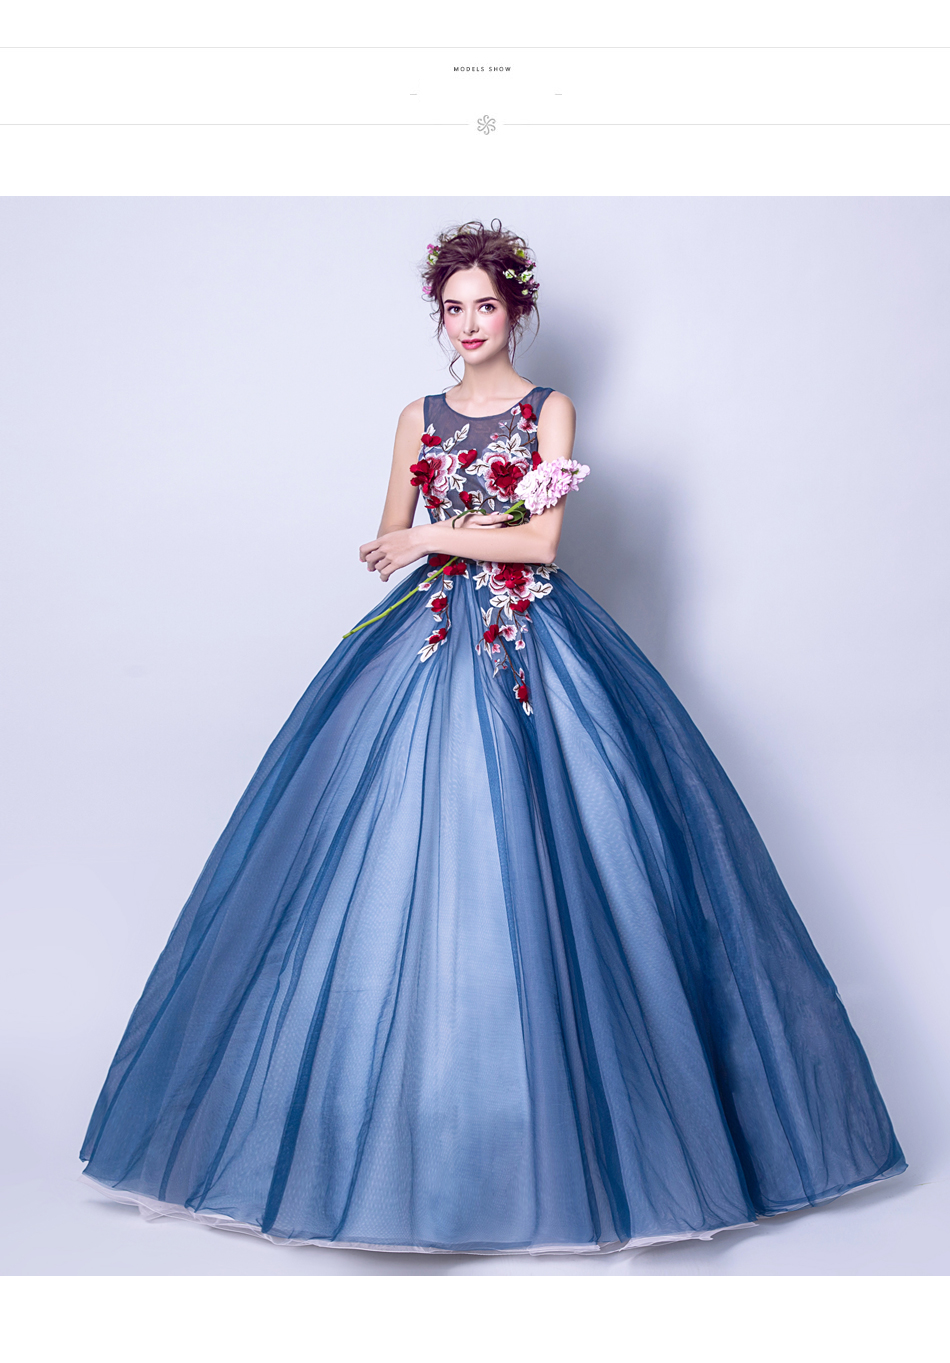 Angel Wedding Dress Marriage Evening Bride Party Prom Bridal Gown Vestido De Noiva Blue camouflage, fantasy flowers 2017 7572 9